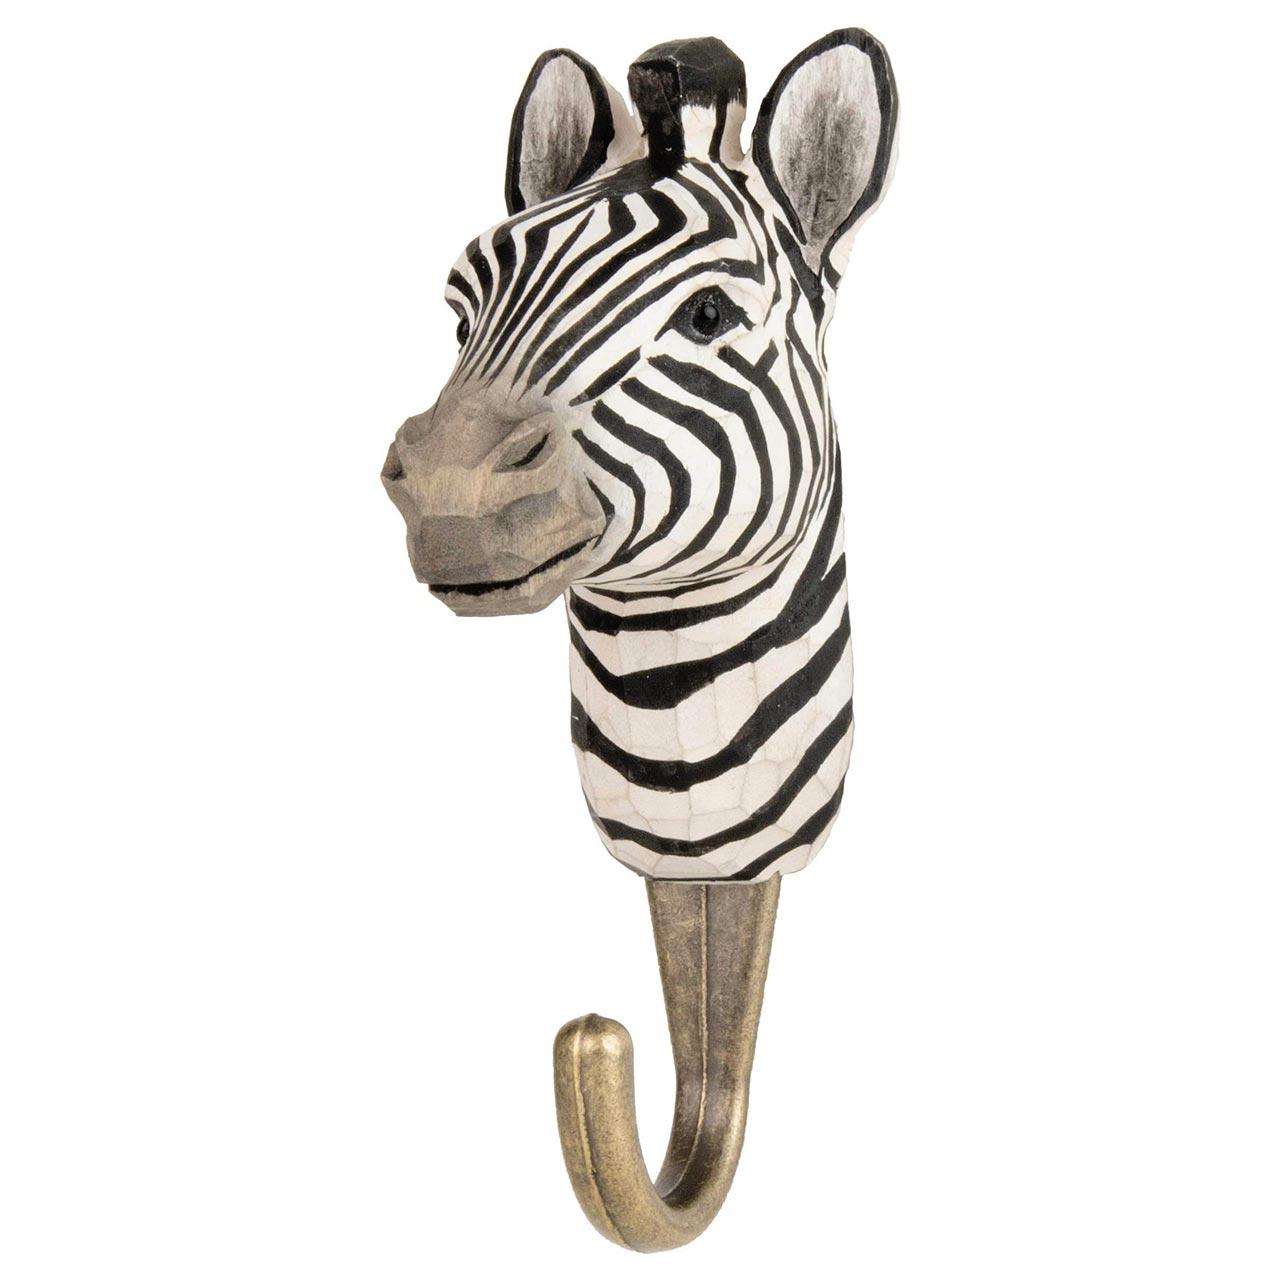 WILDLIFE GARDEN Wall Hook Zebra | the design gift shop